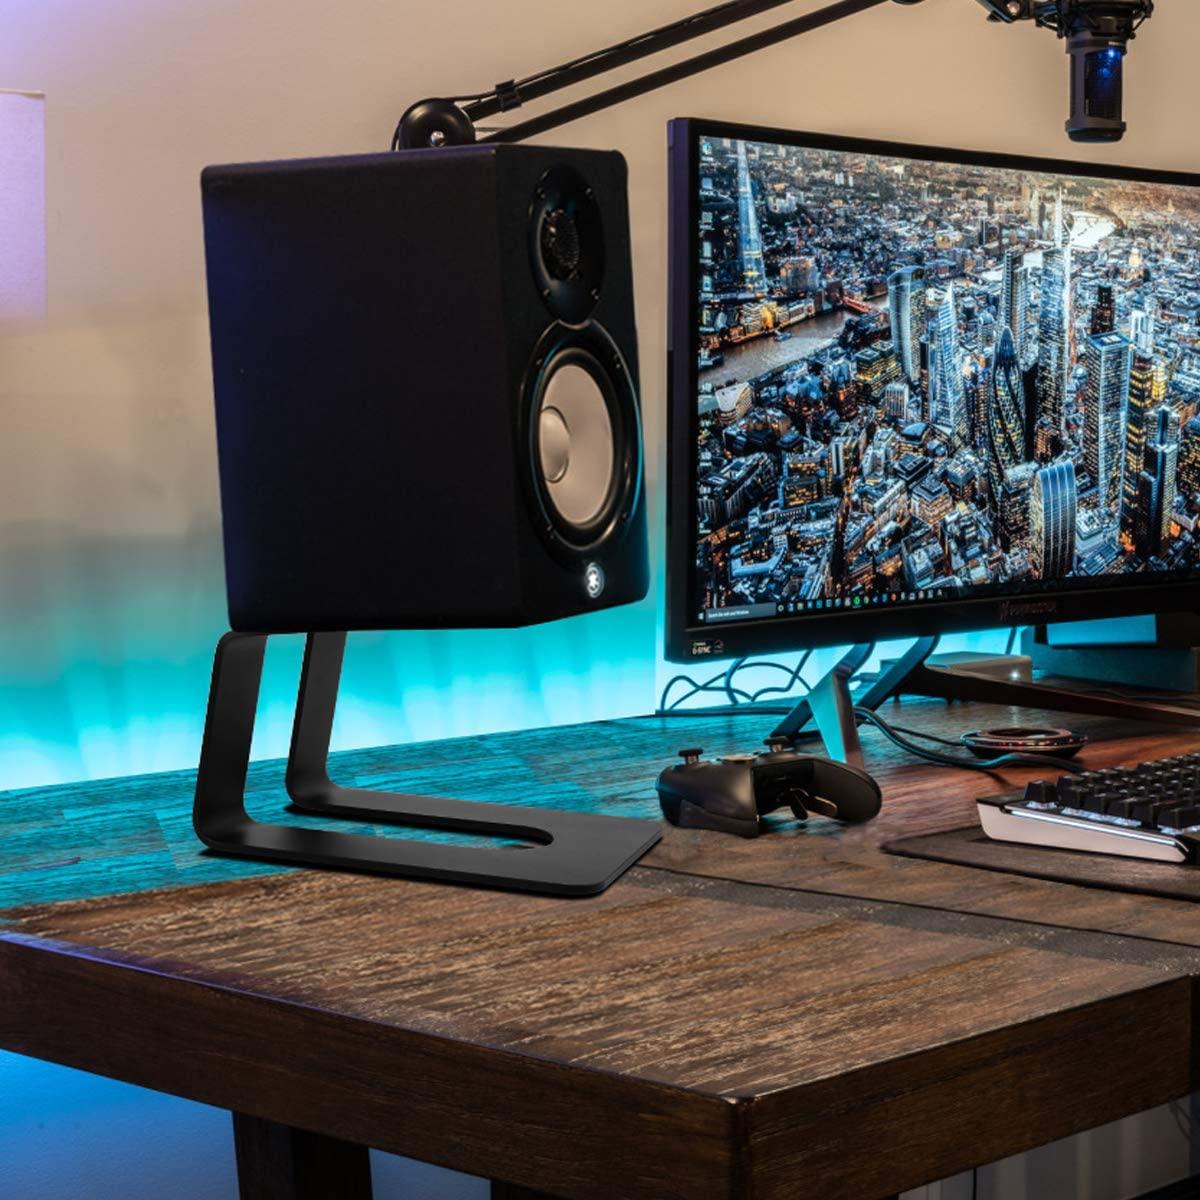 Stageek Aluminum Desktop Speaker Stands on wooden table